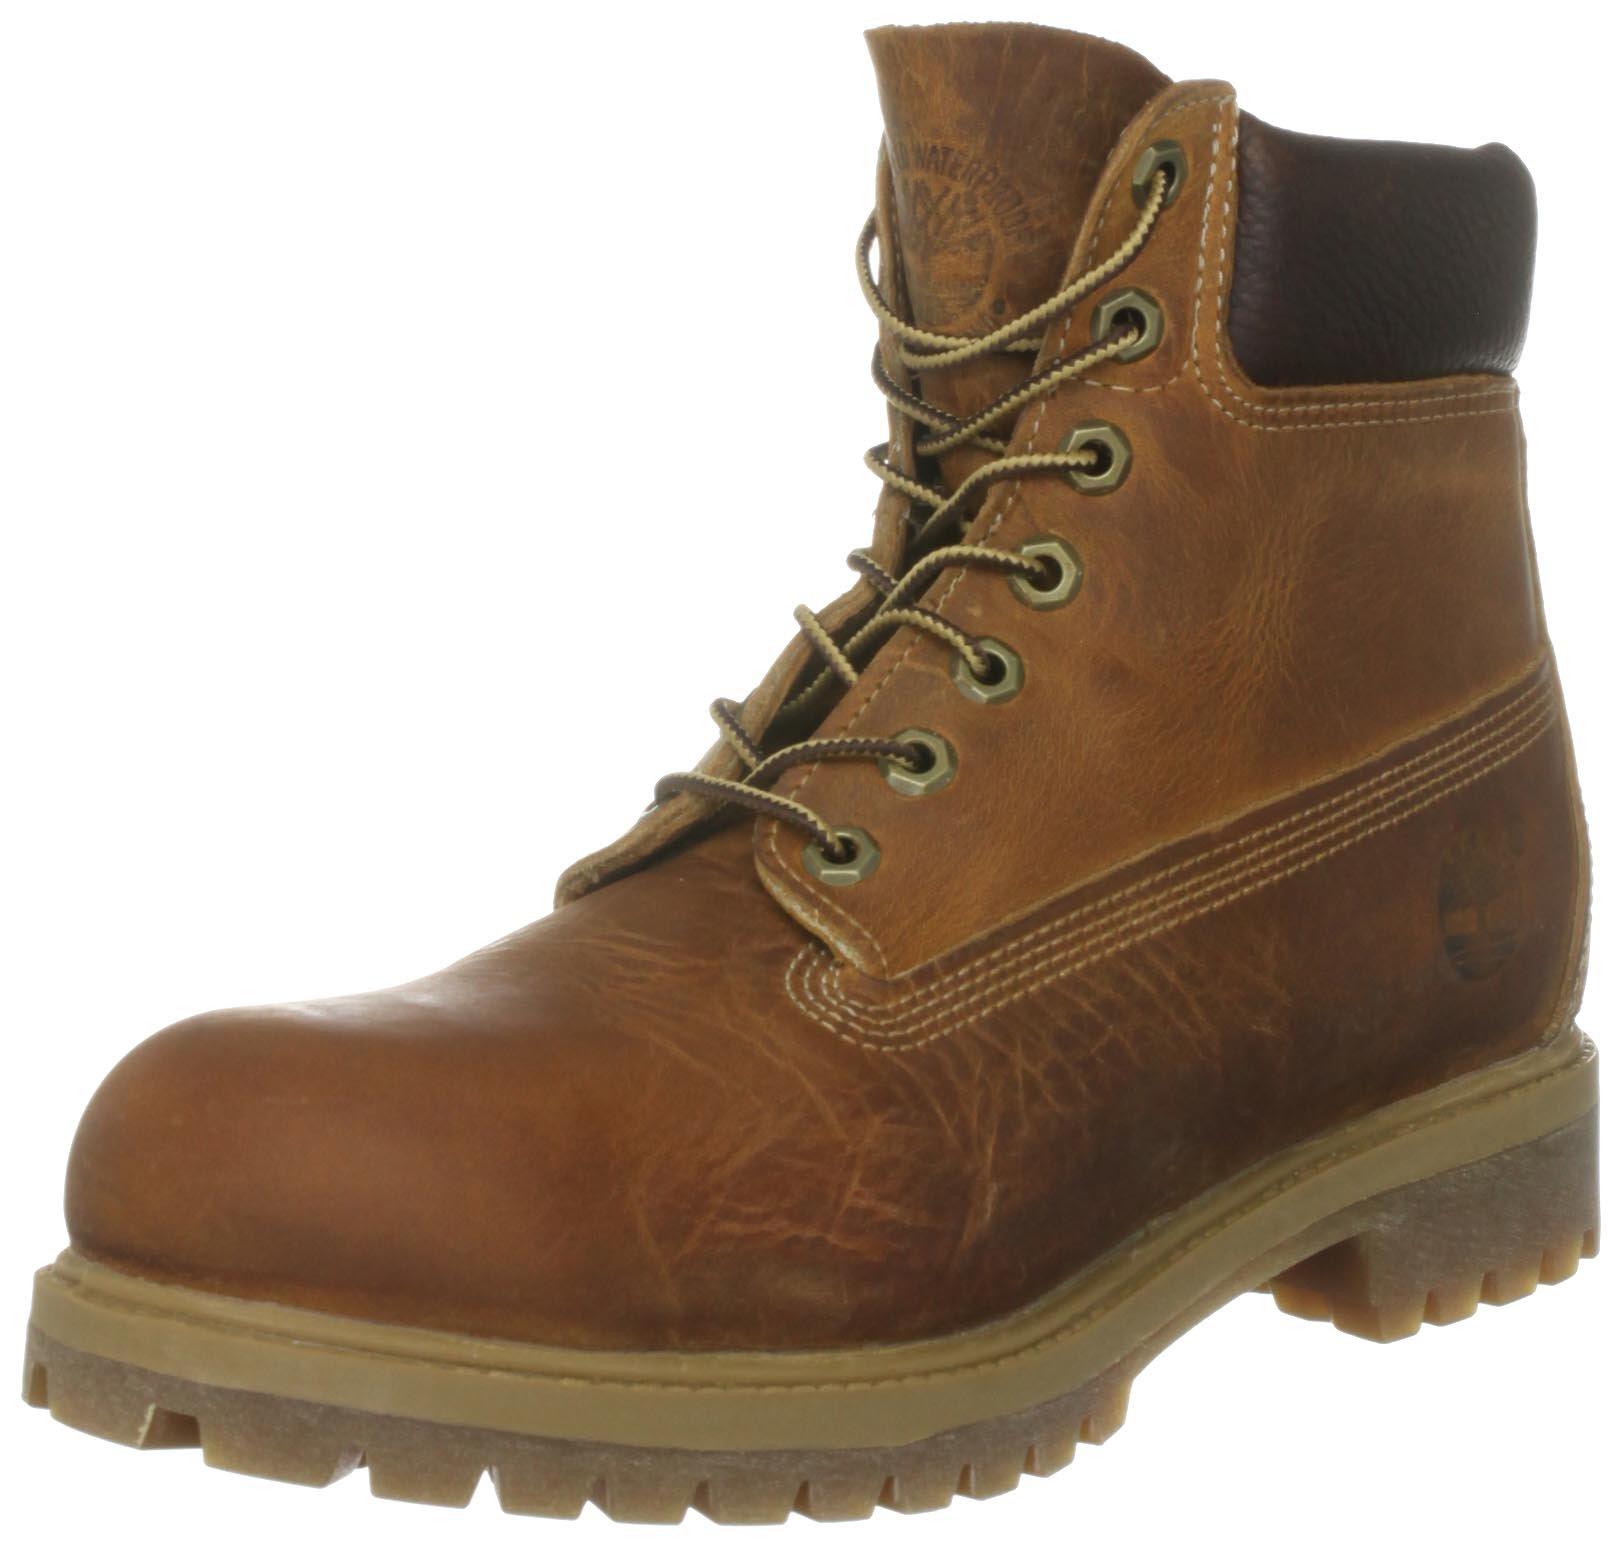 Timberland Mens Heritage 6'' Premium Boot Burnt Orange Worn Oiled All Leather 9W